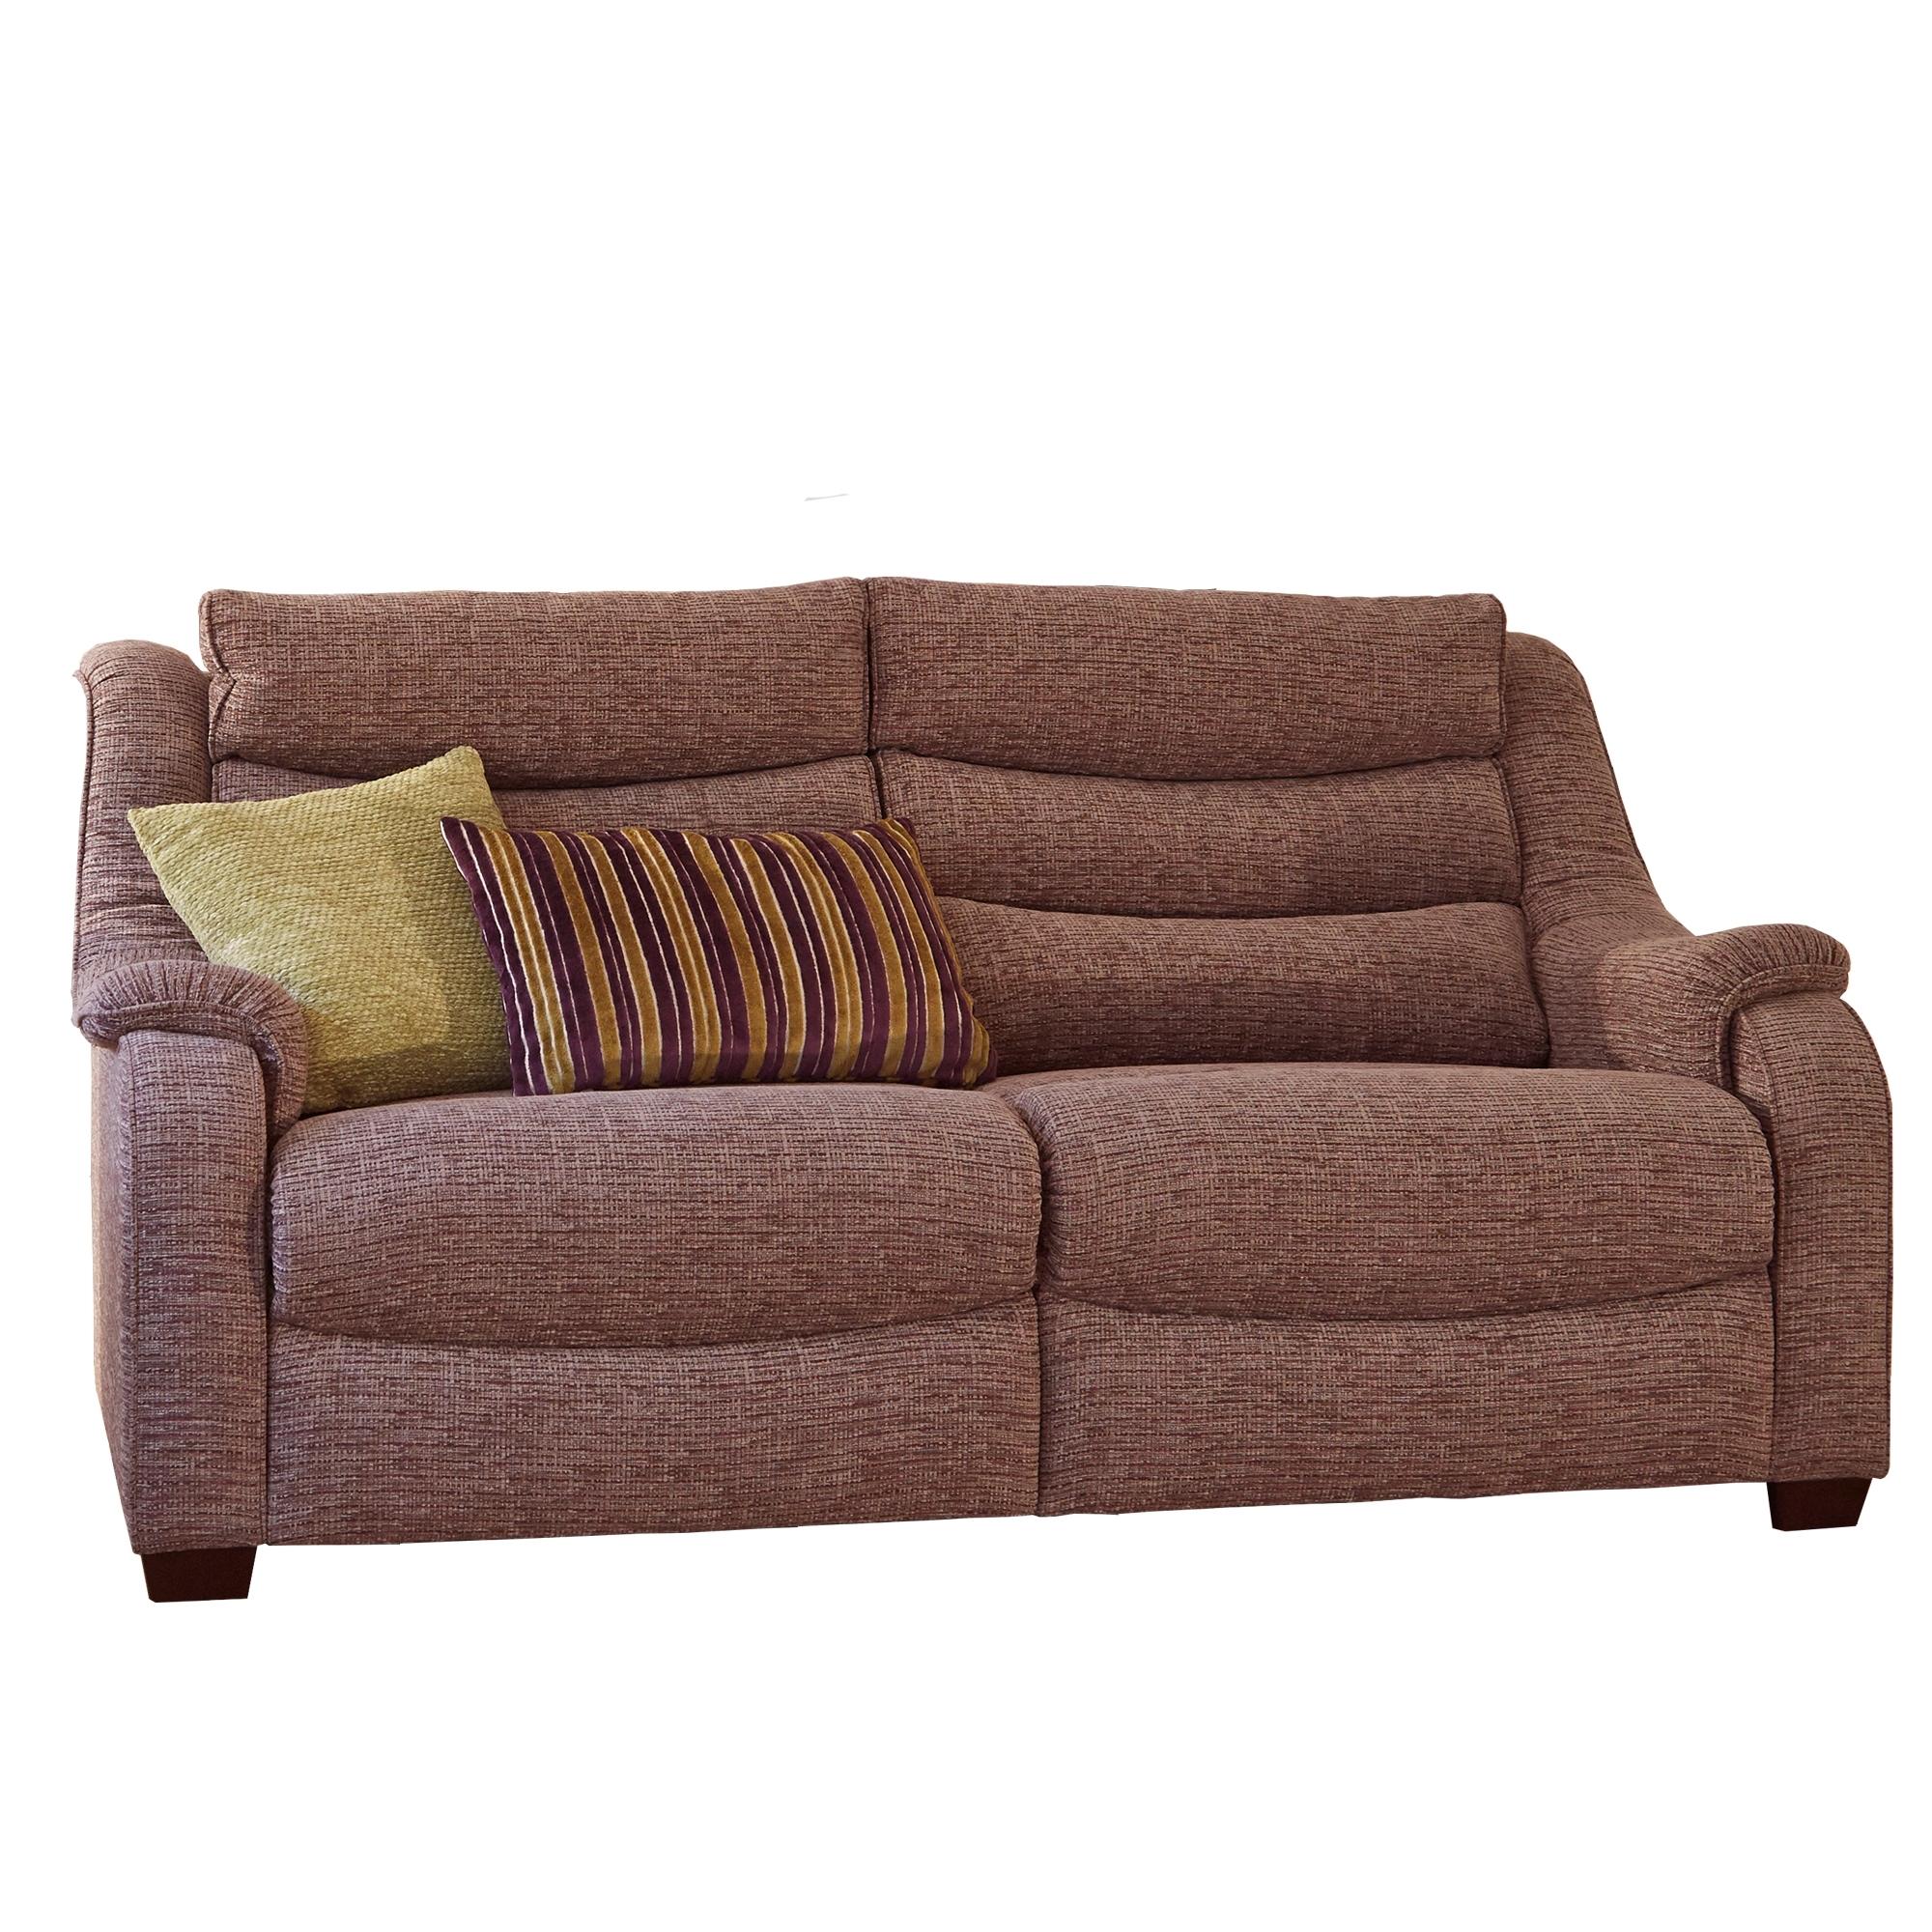 Parker Knoll Denver Large 2 Seater Sofa All Sofas